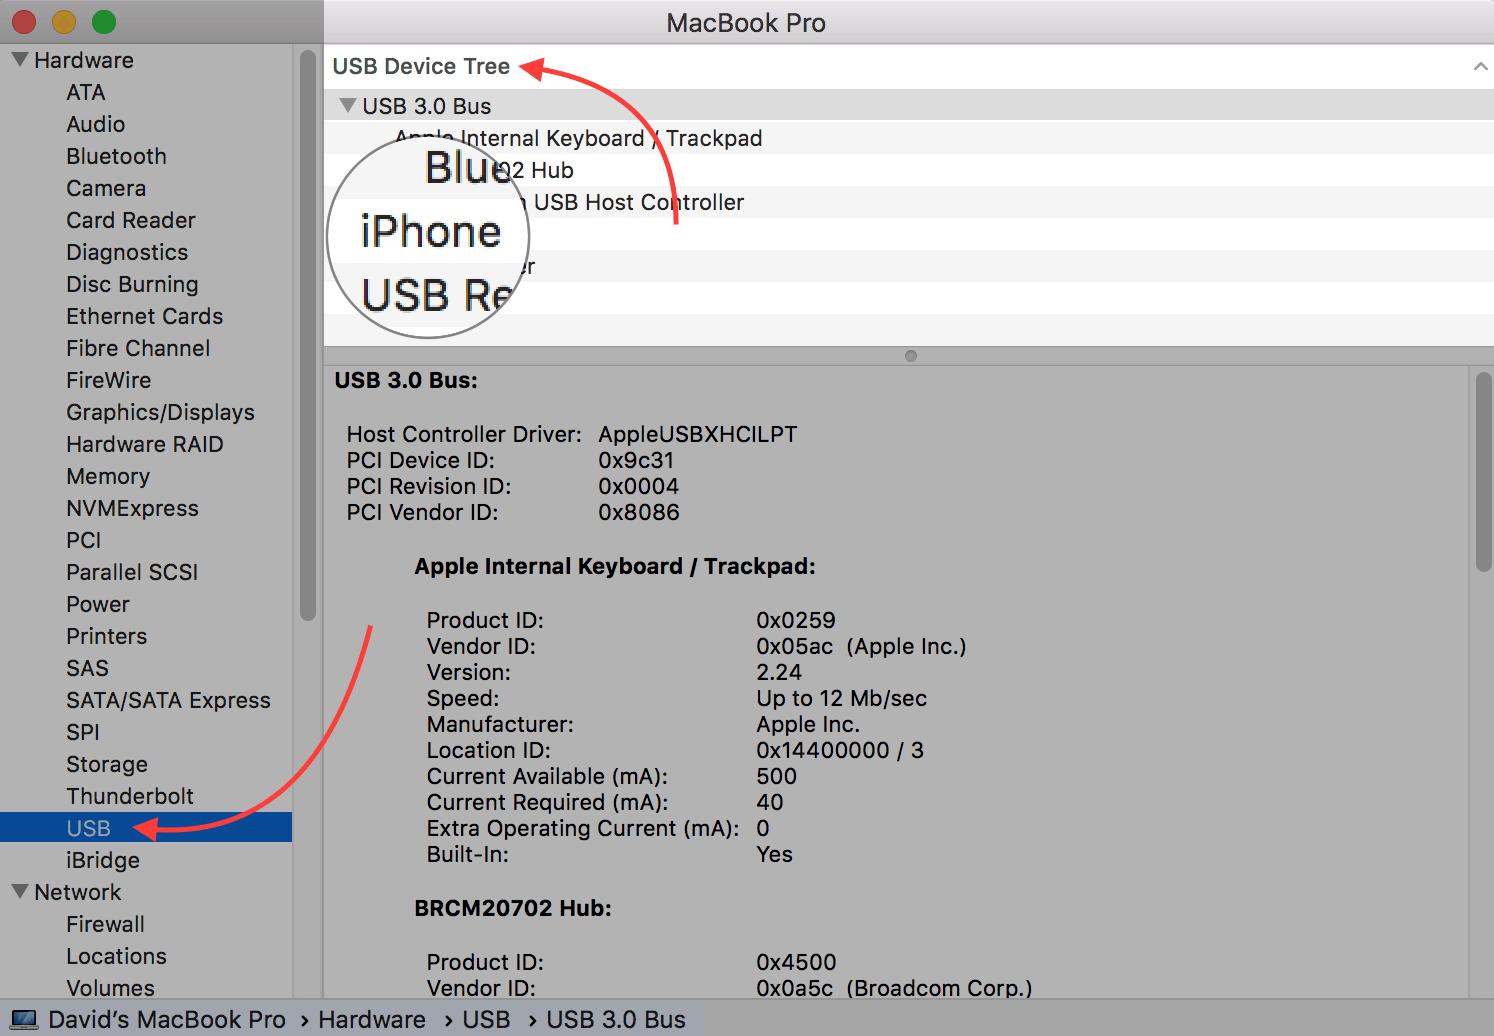 iphone under usb device tree